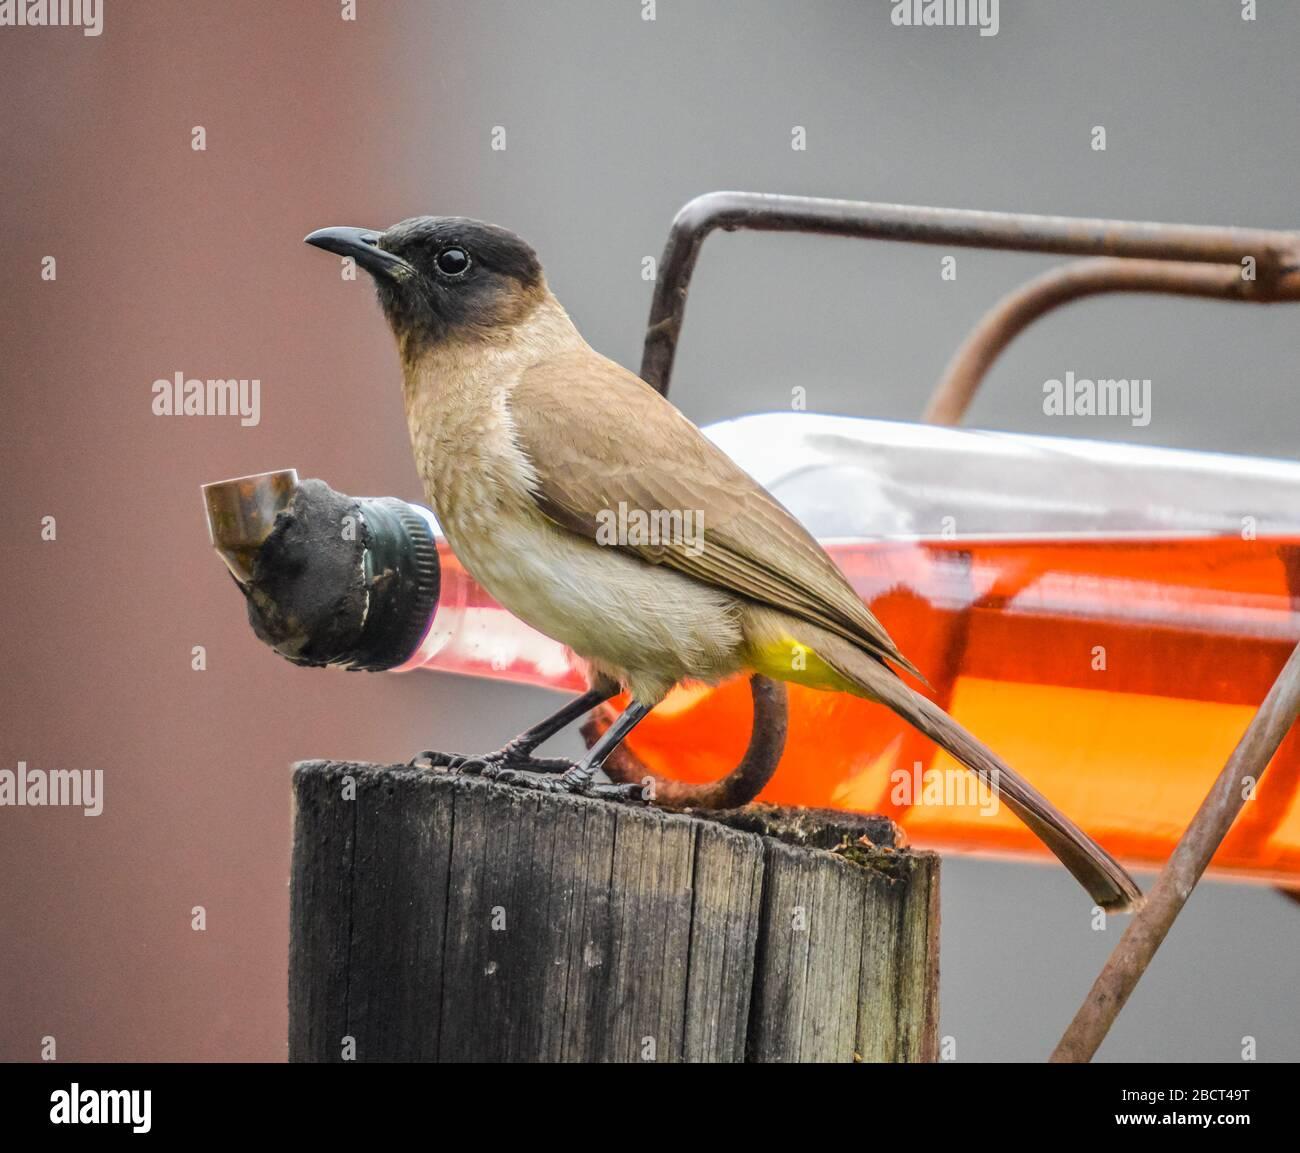 African cape bulbul or Pycnonotus capensis feeding on a bird feeder iin South Africa Stock Photo